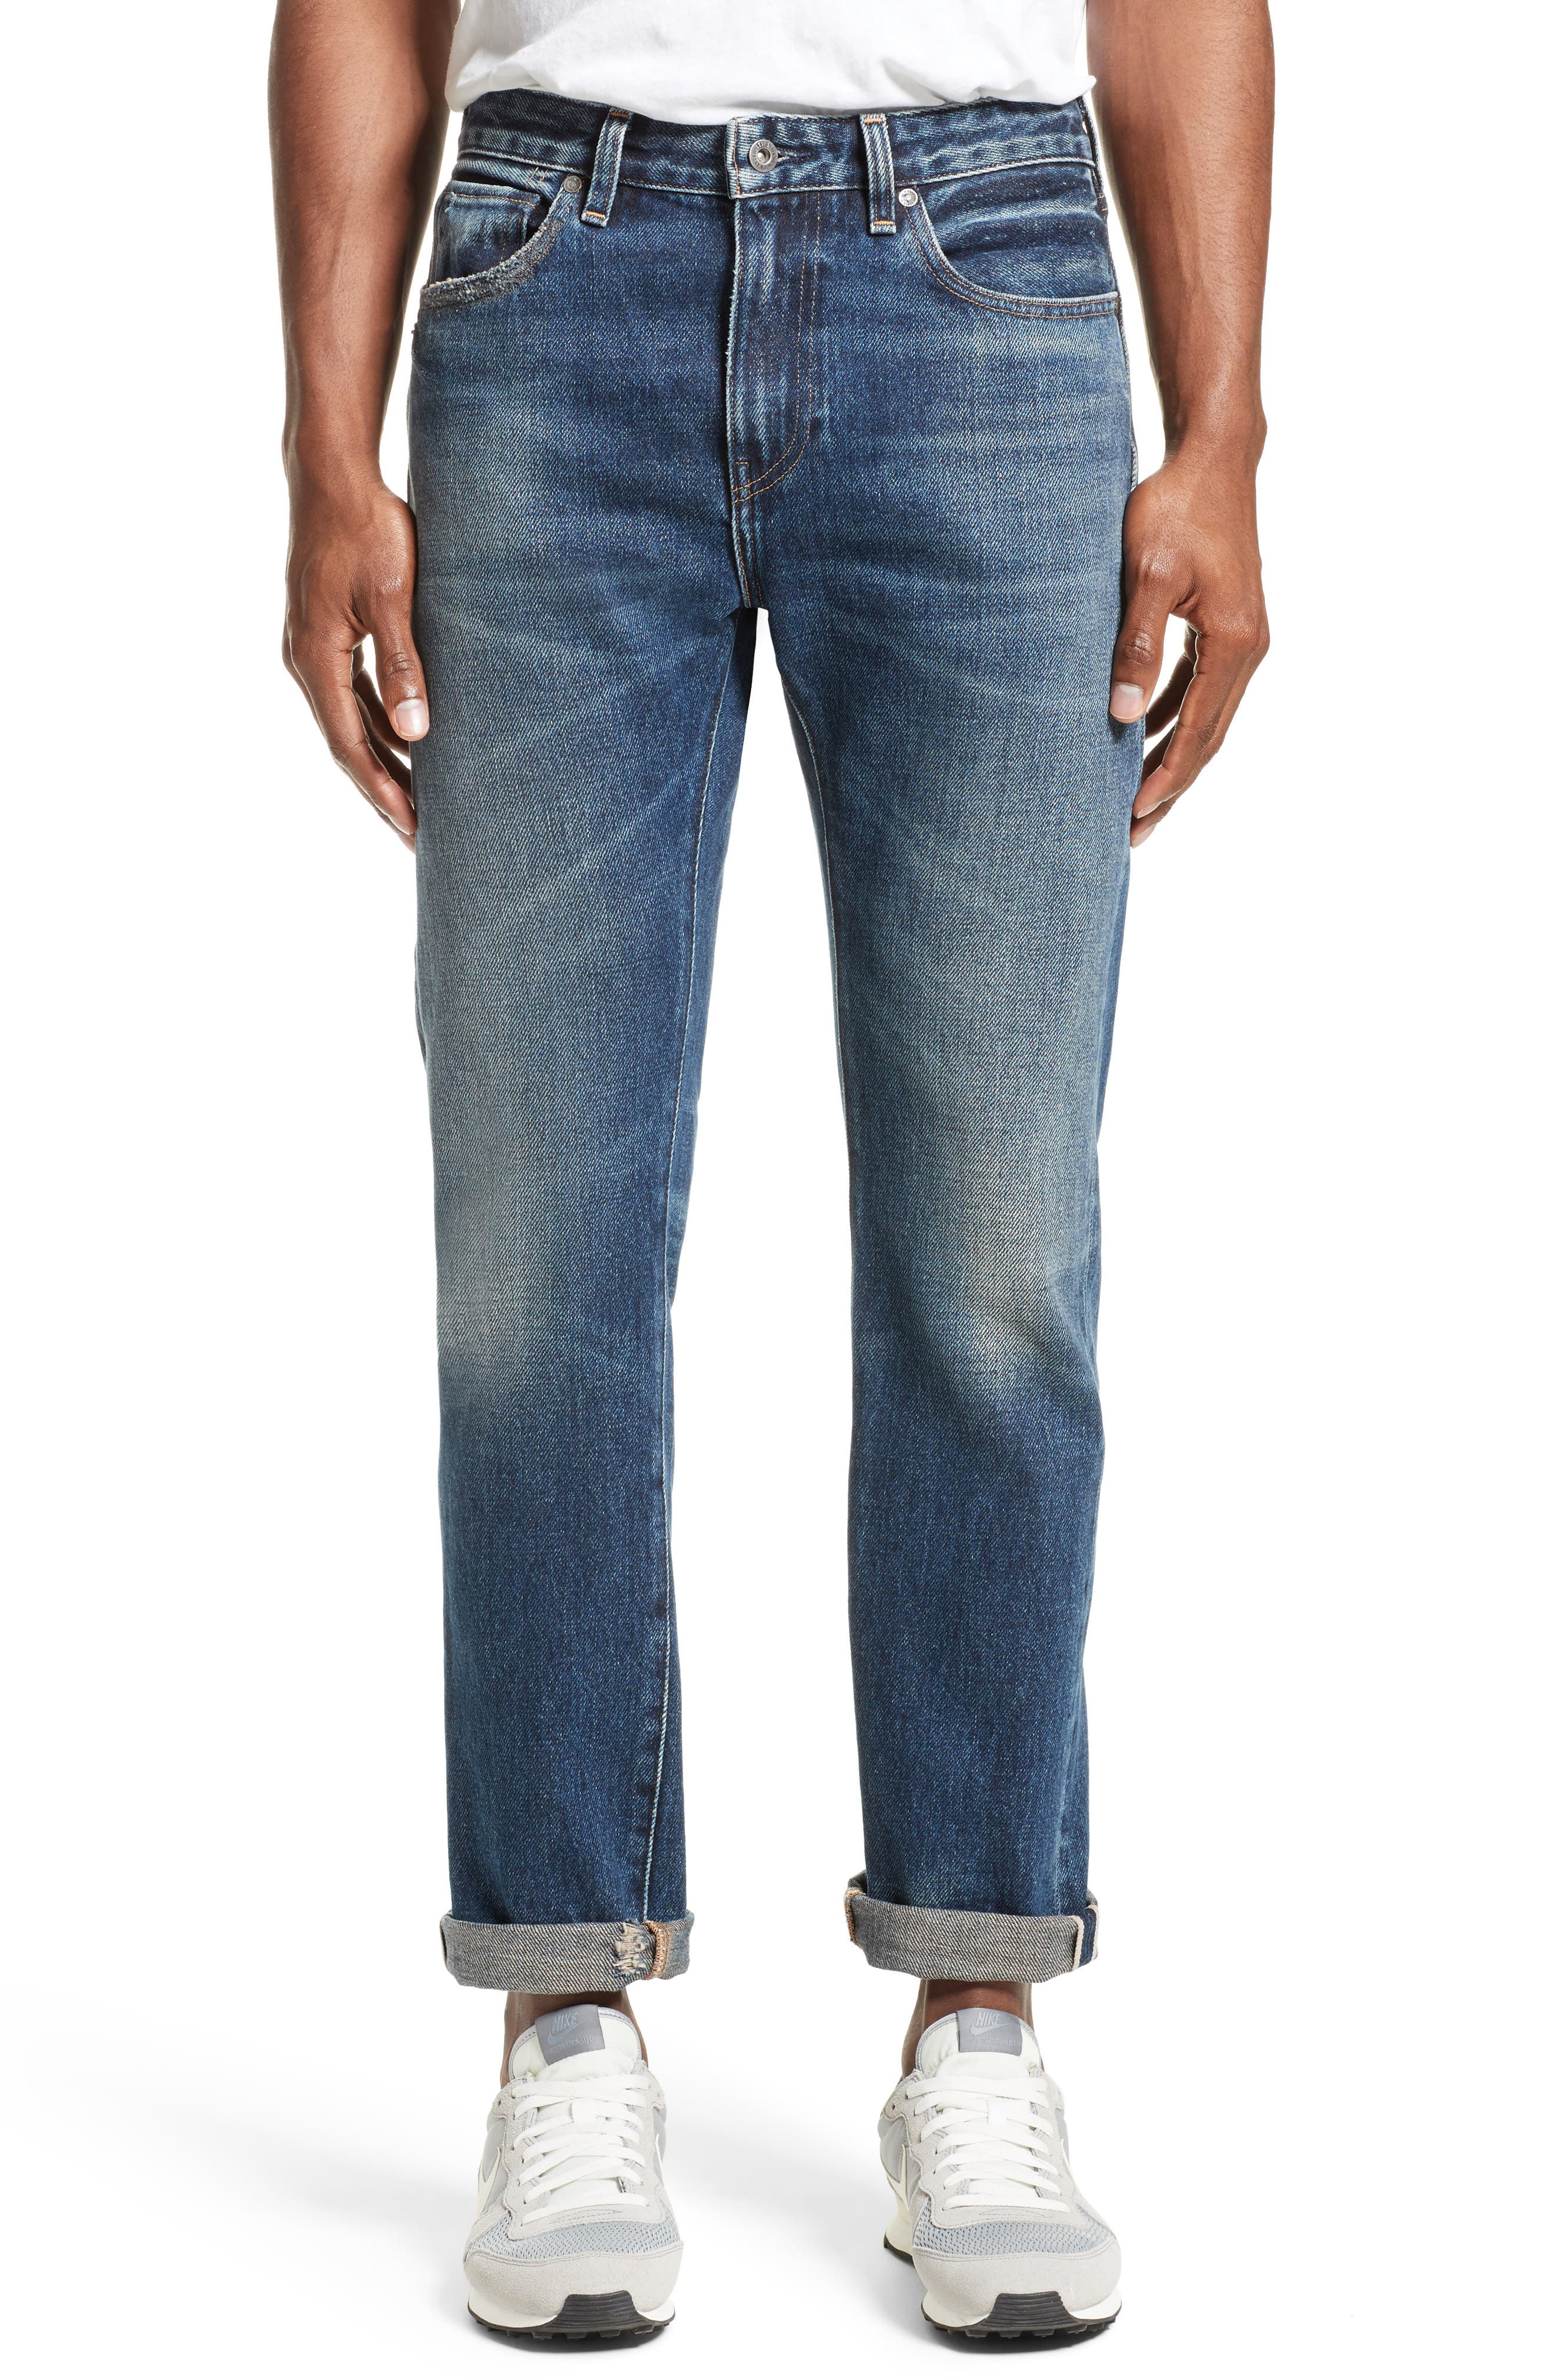 Tack Slim Fit Jeans,                         Main,                         color, Medium Blue